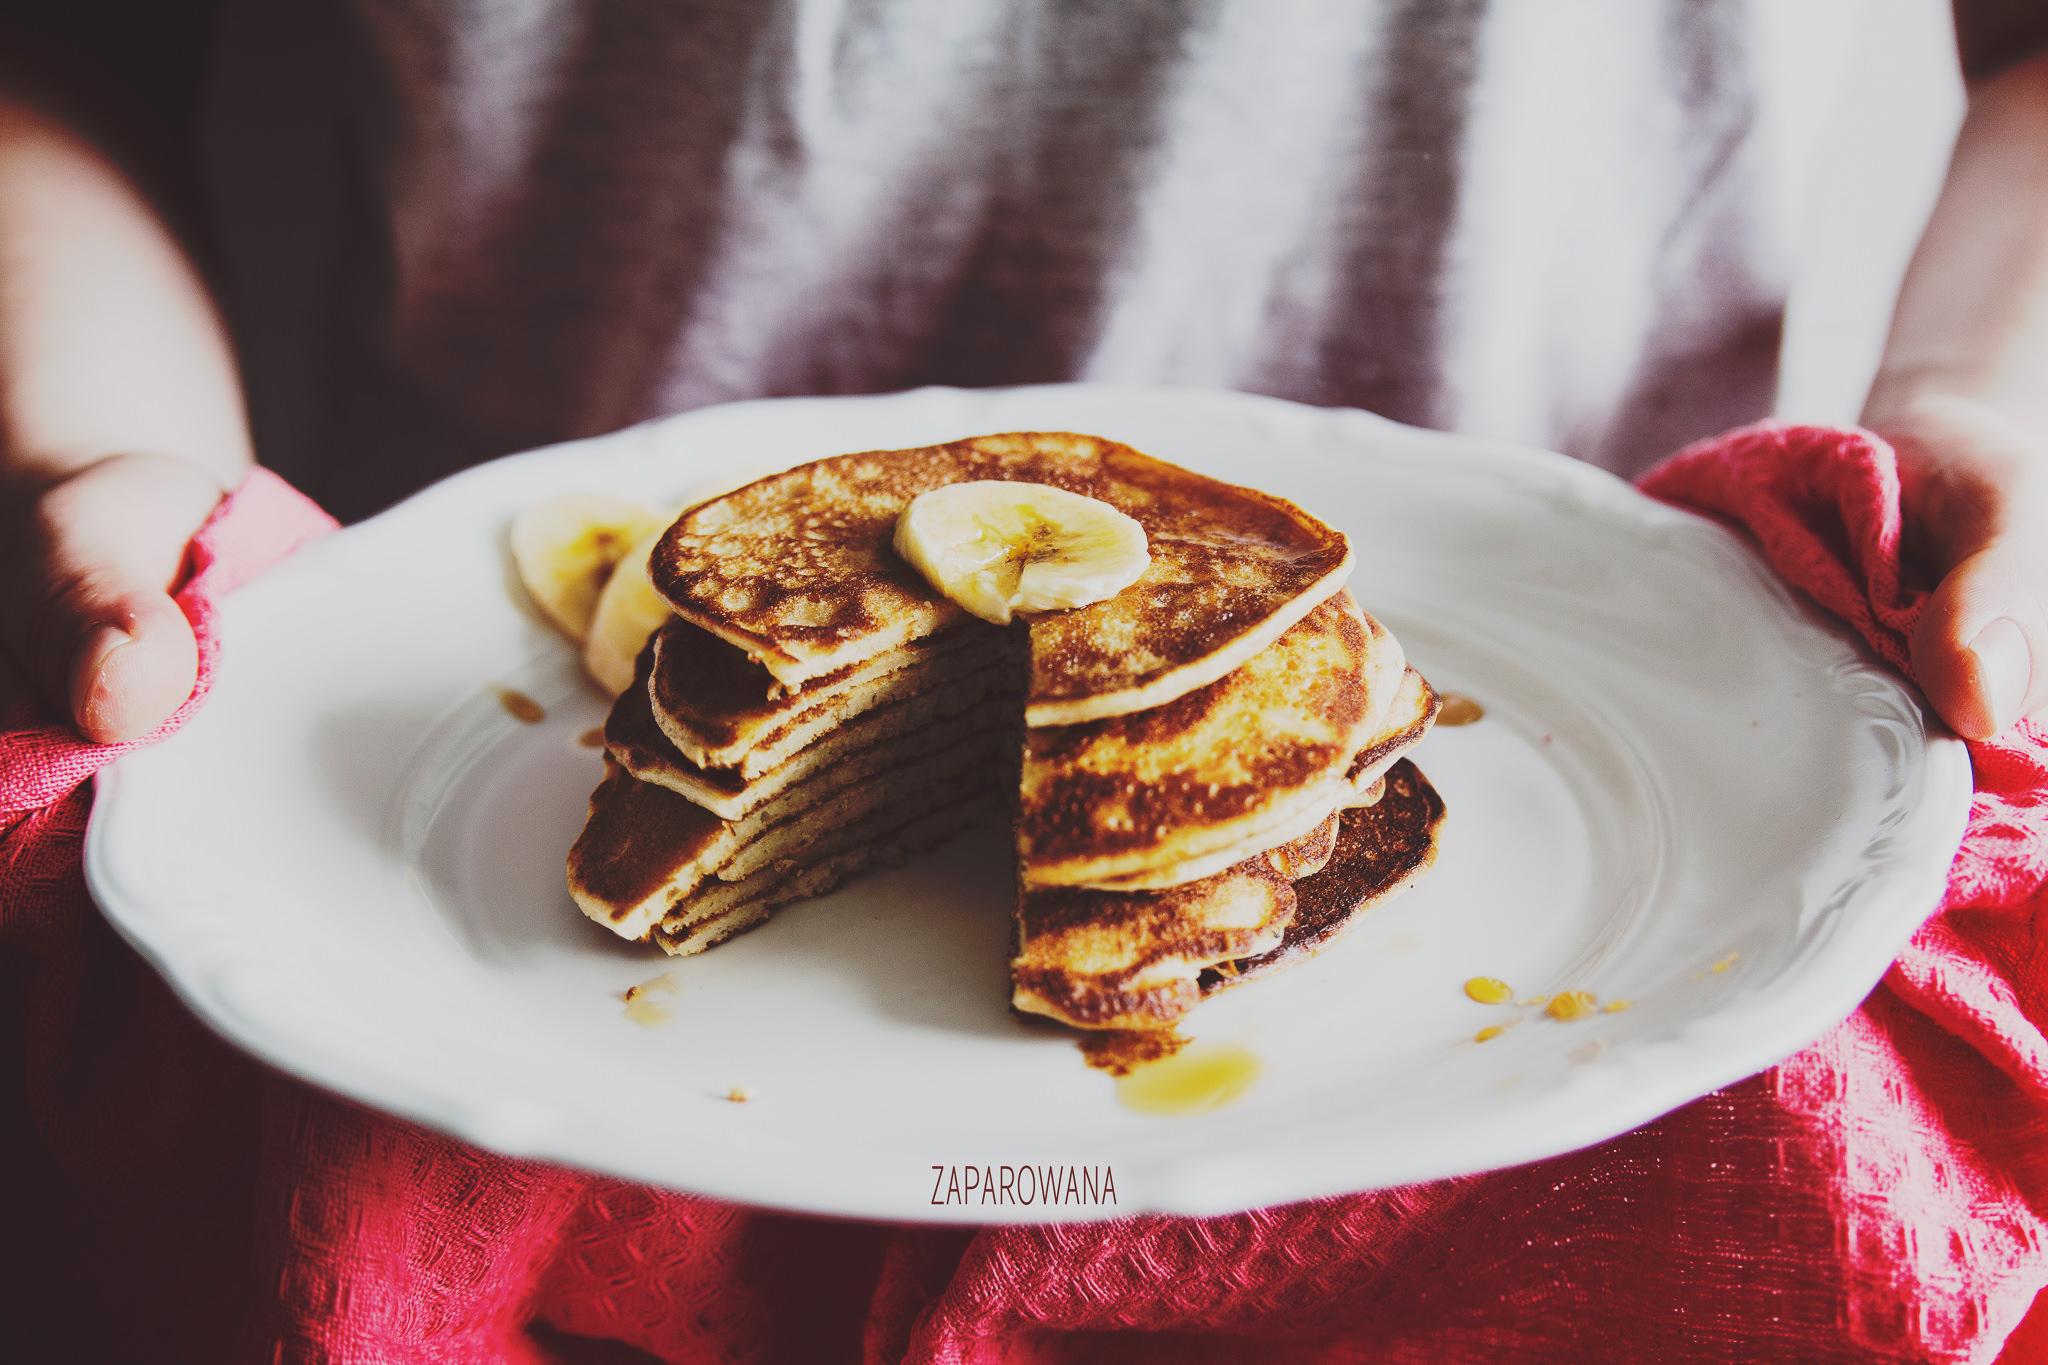 ZAPAROWANA Pancake Day